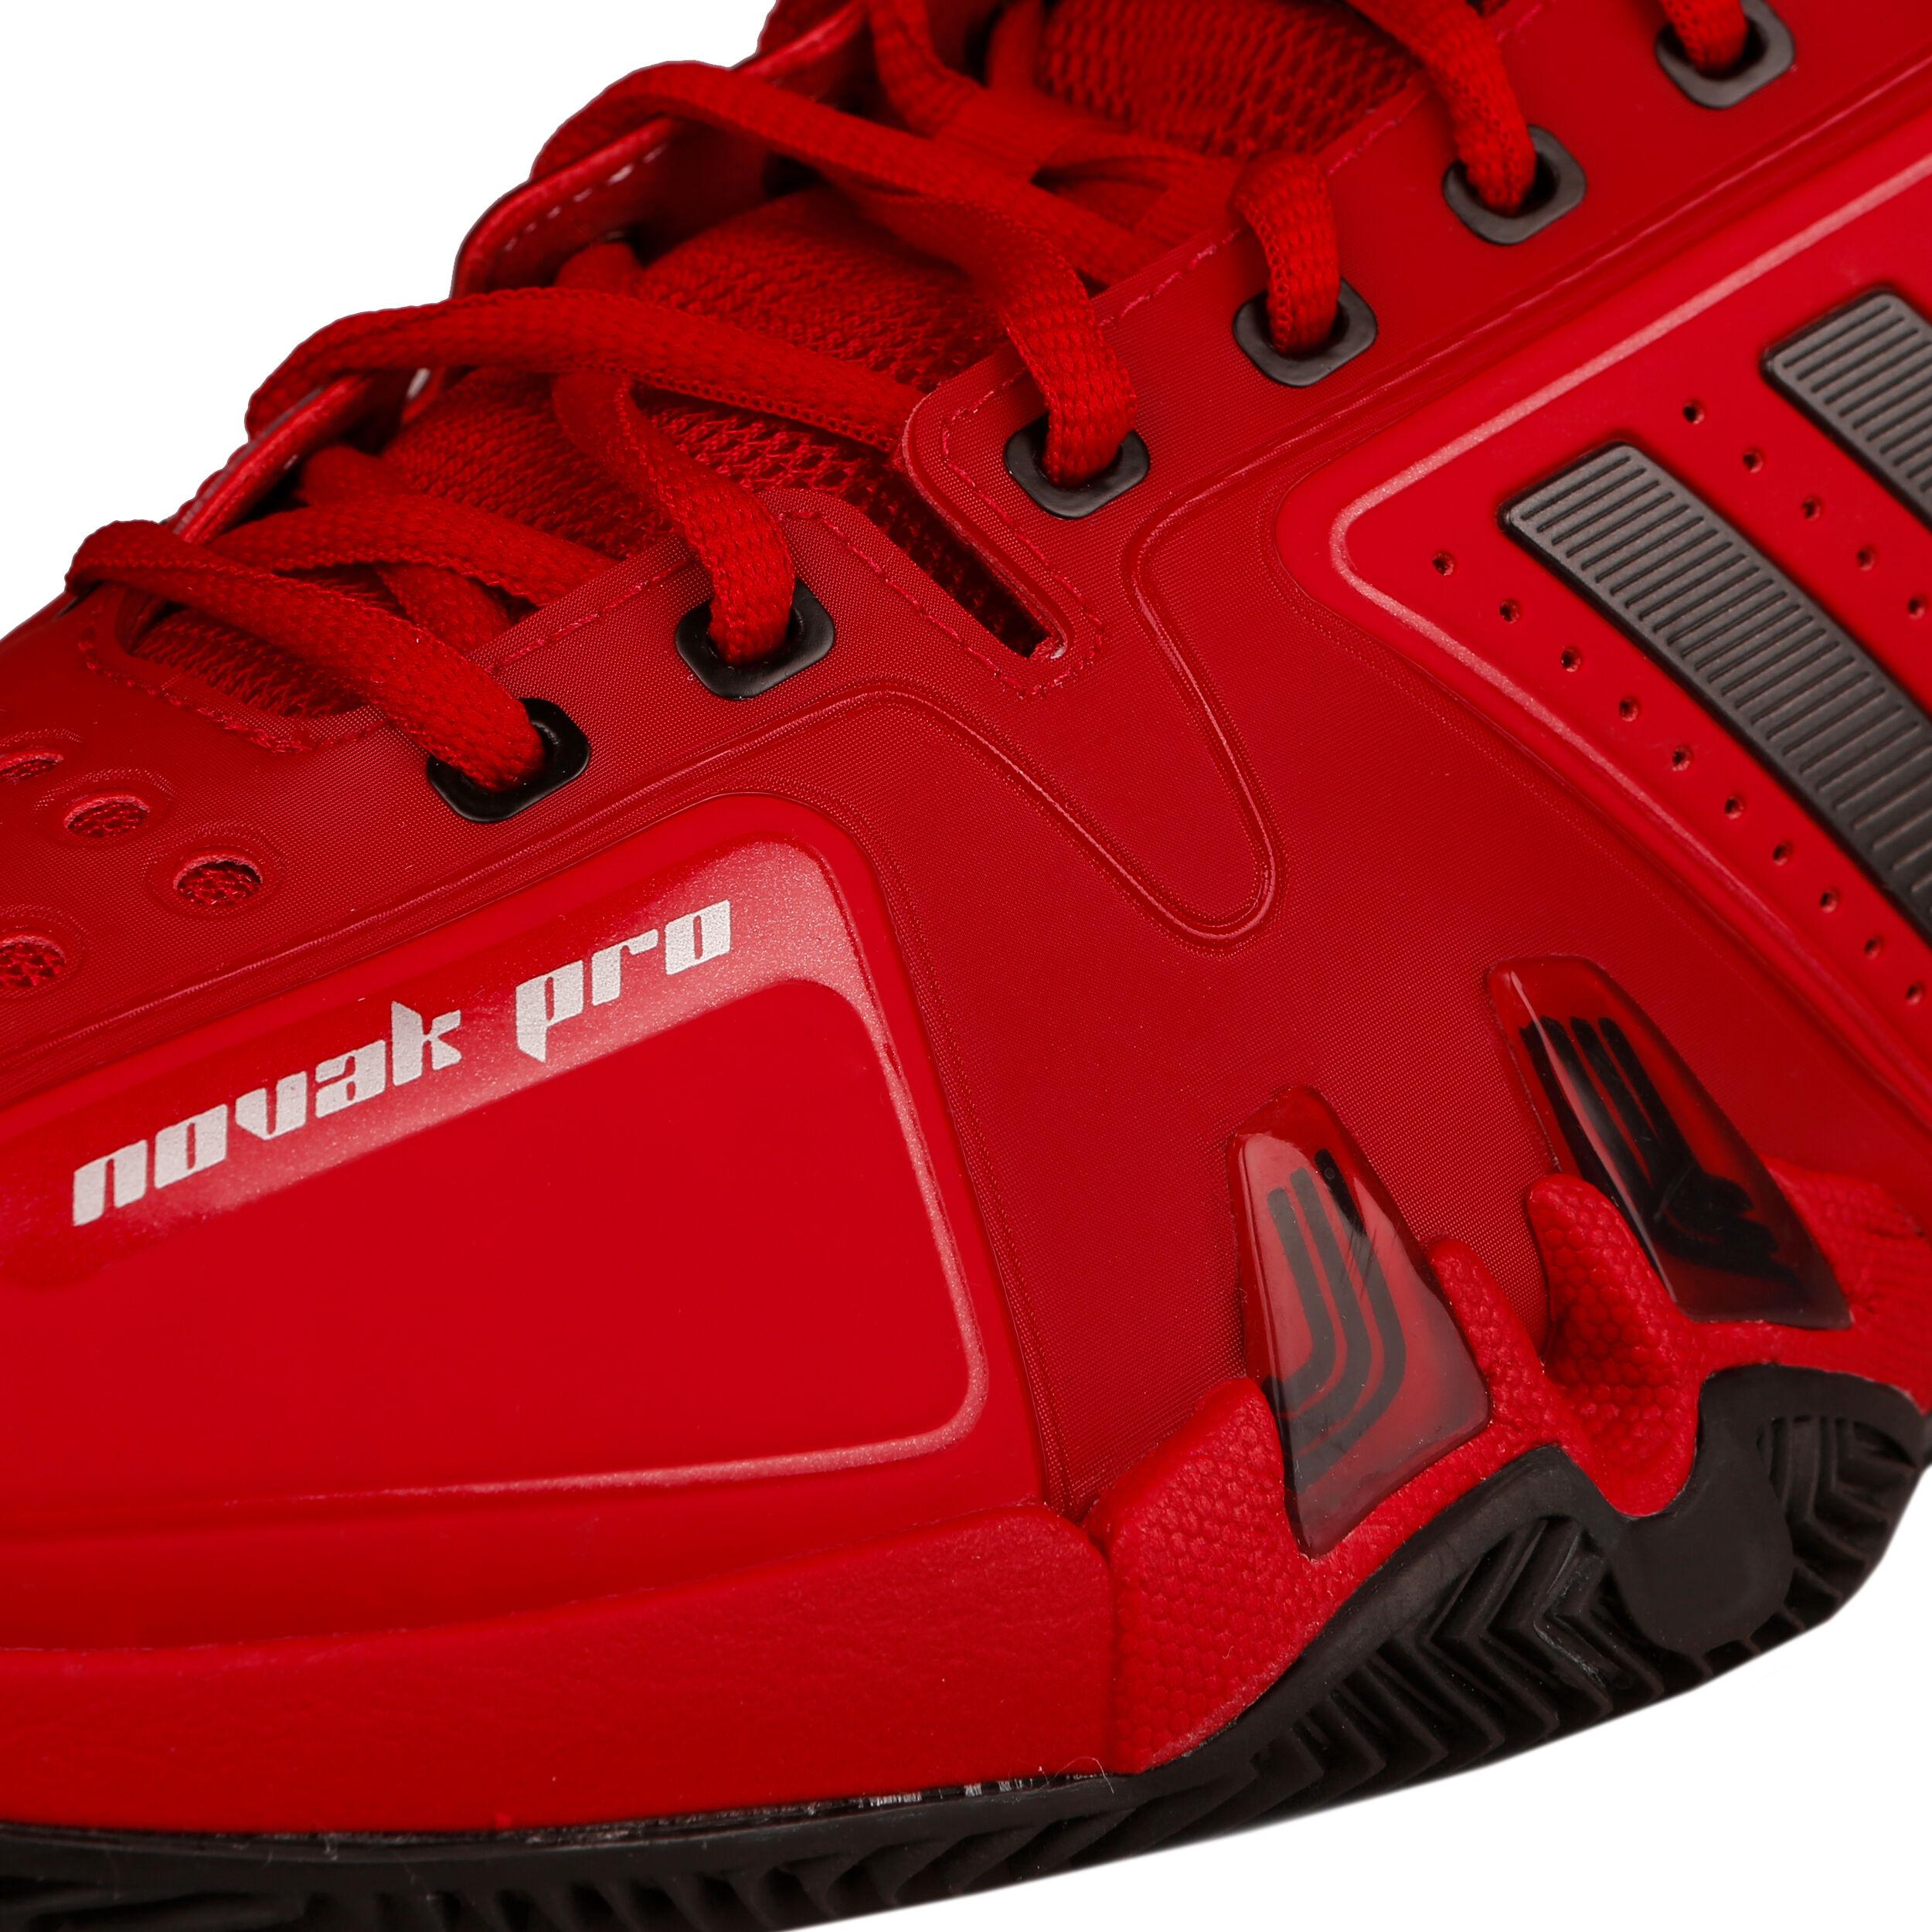 adidas Novak Pro Chaussure Terre Battue Hommes Rouge